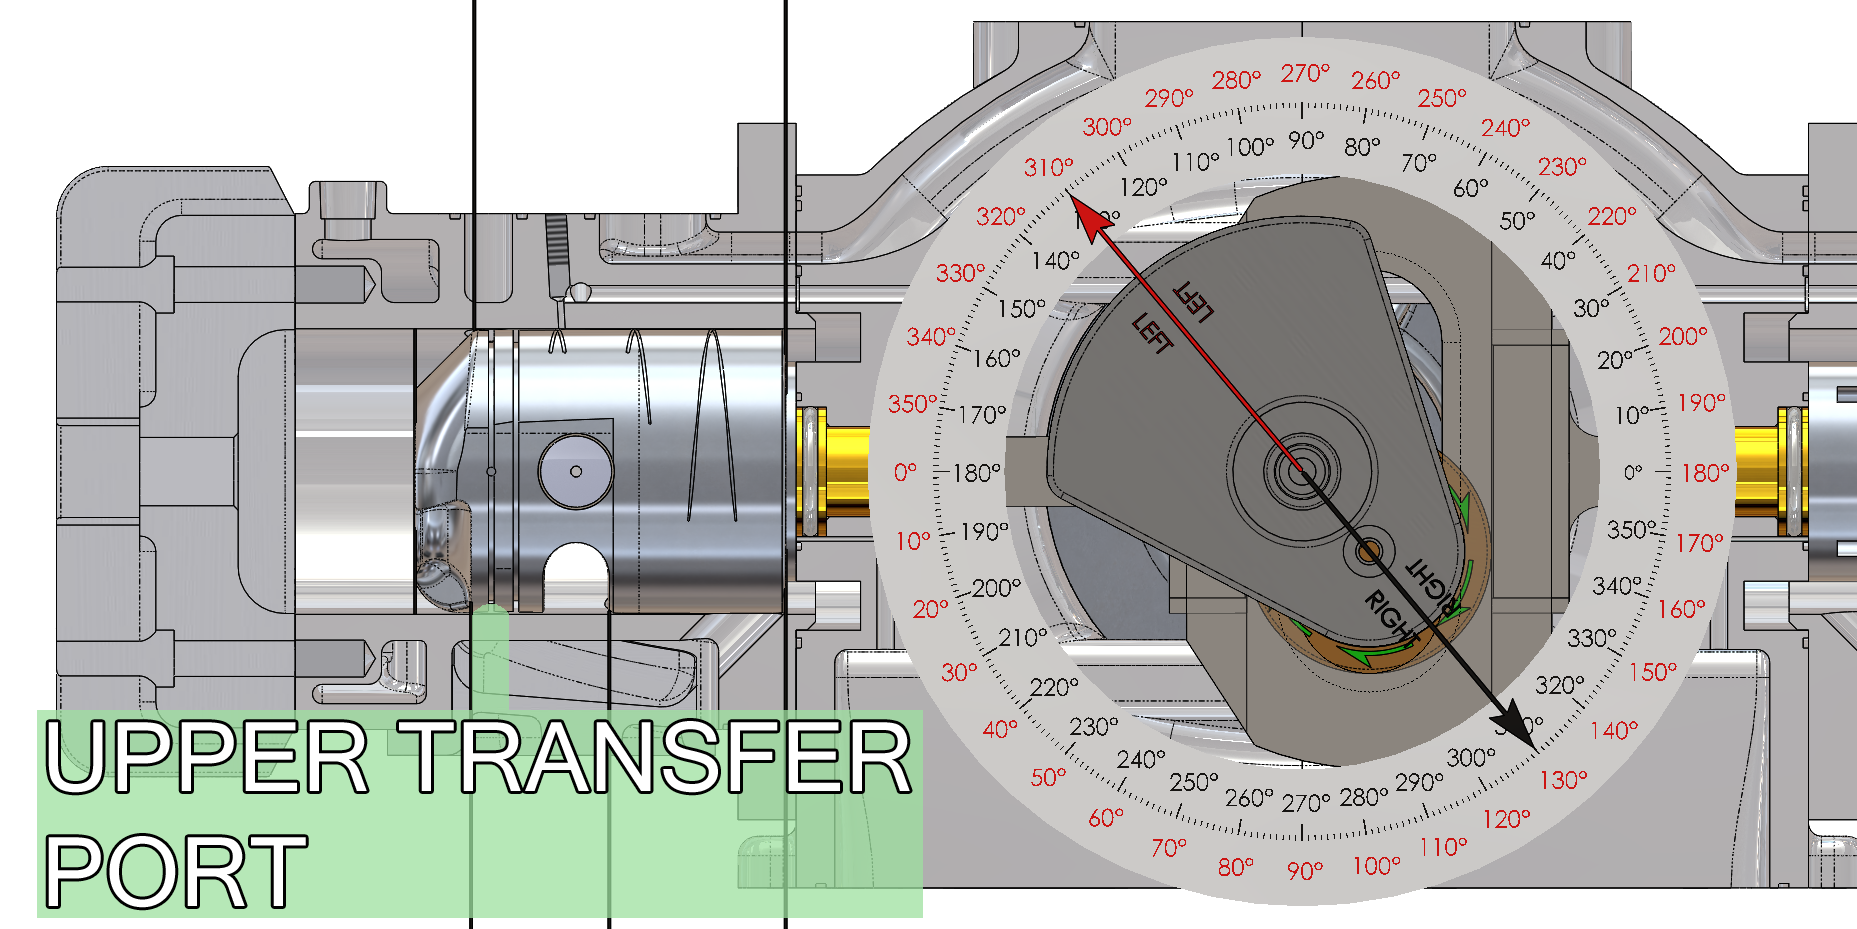 Upper Transfer Ports